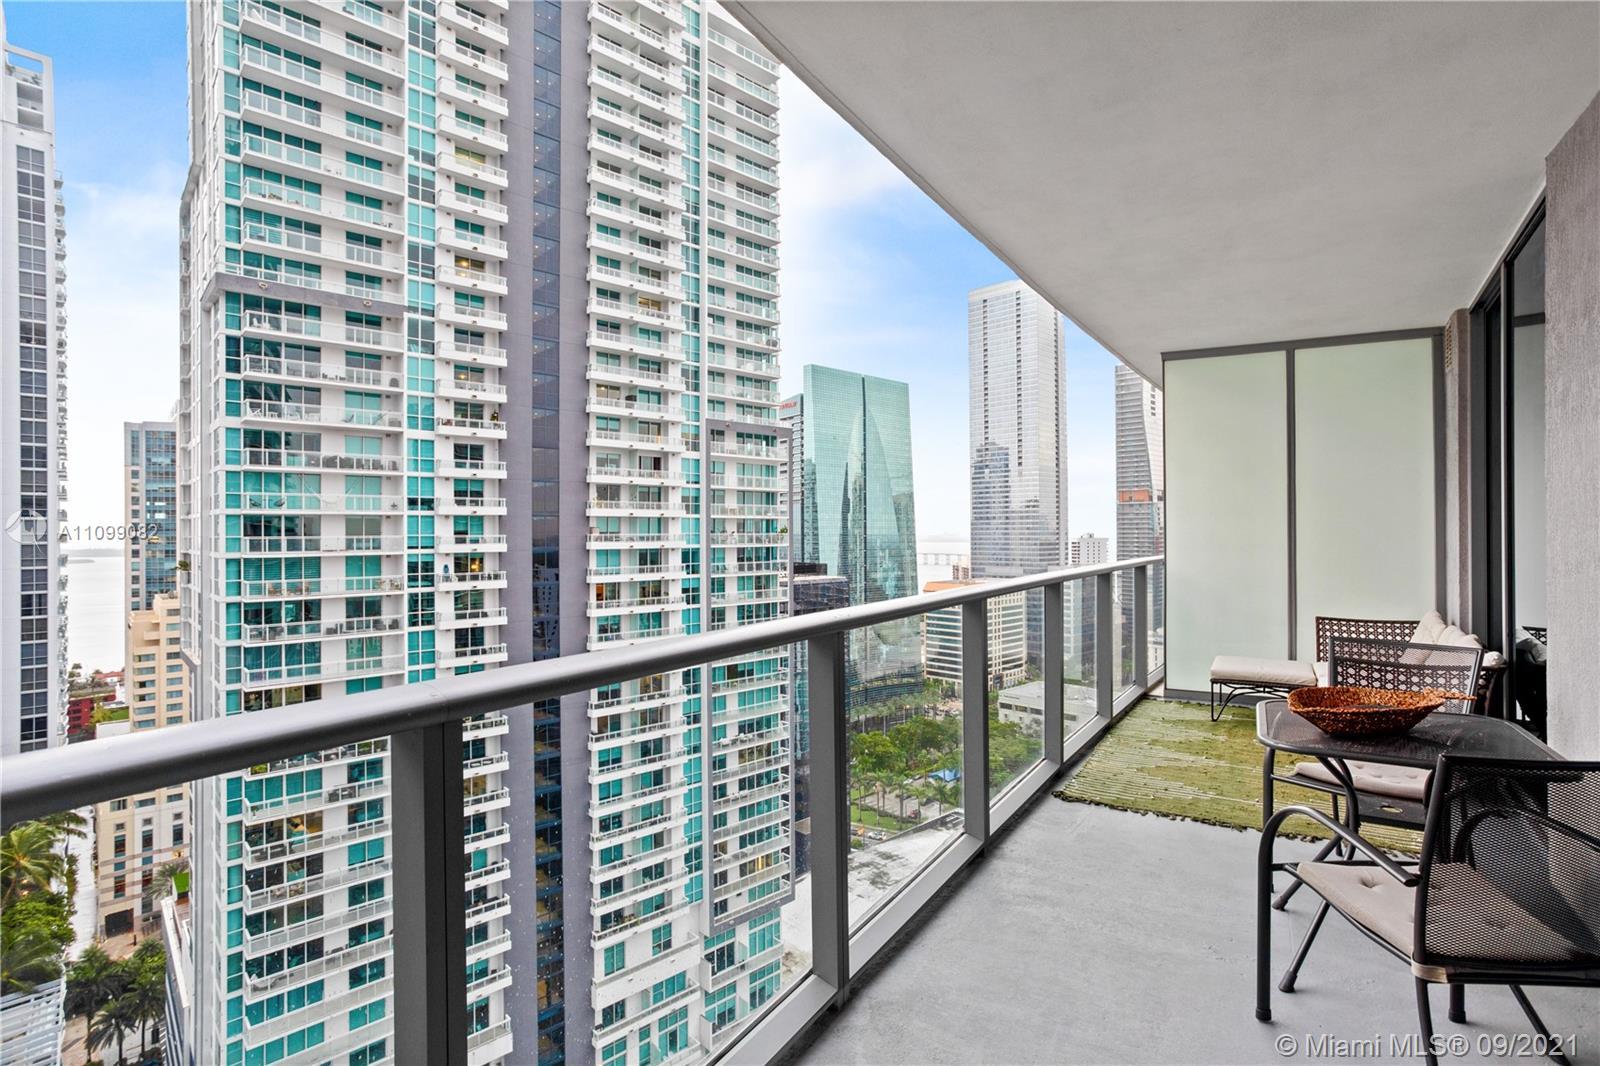 1100 Millecento #2611 - 1100 S Miami Ave #2611, Miami, FL 33130